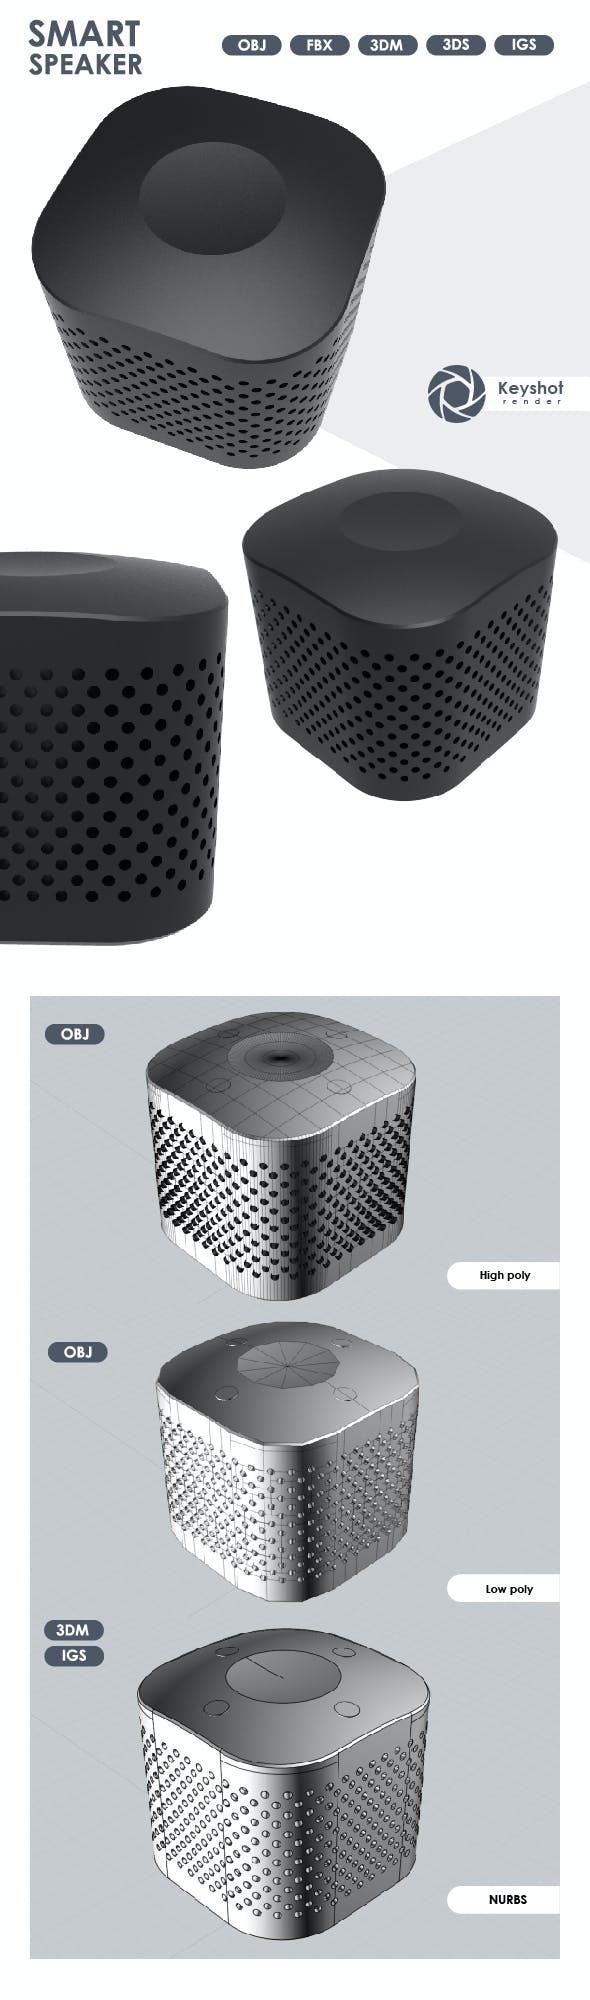 3D Model of Smart Speaker. - 3DOcean Item for Sale